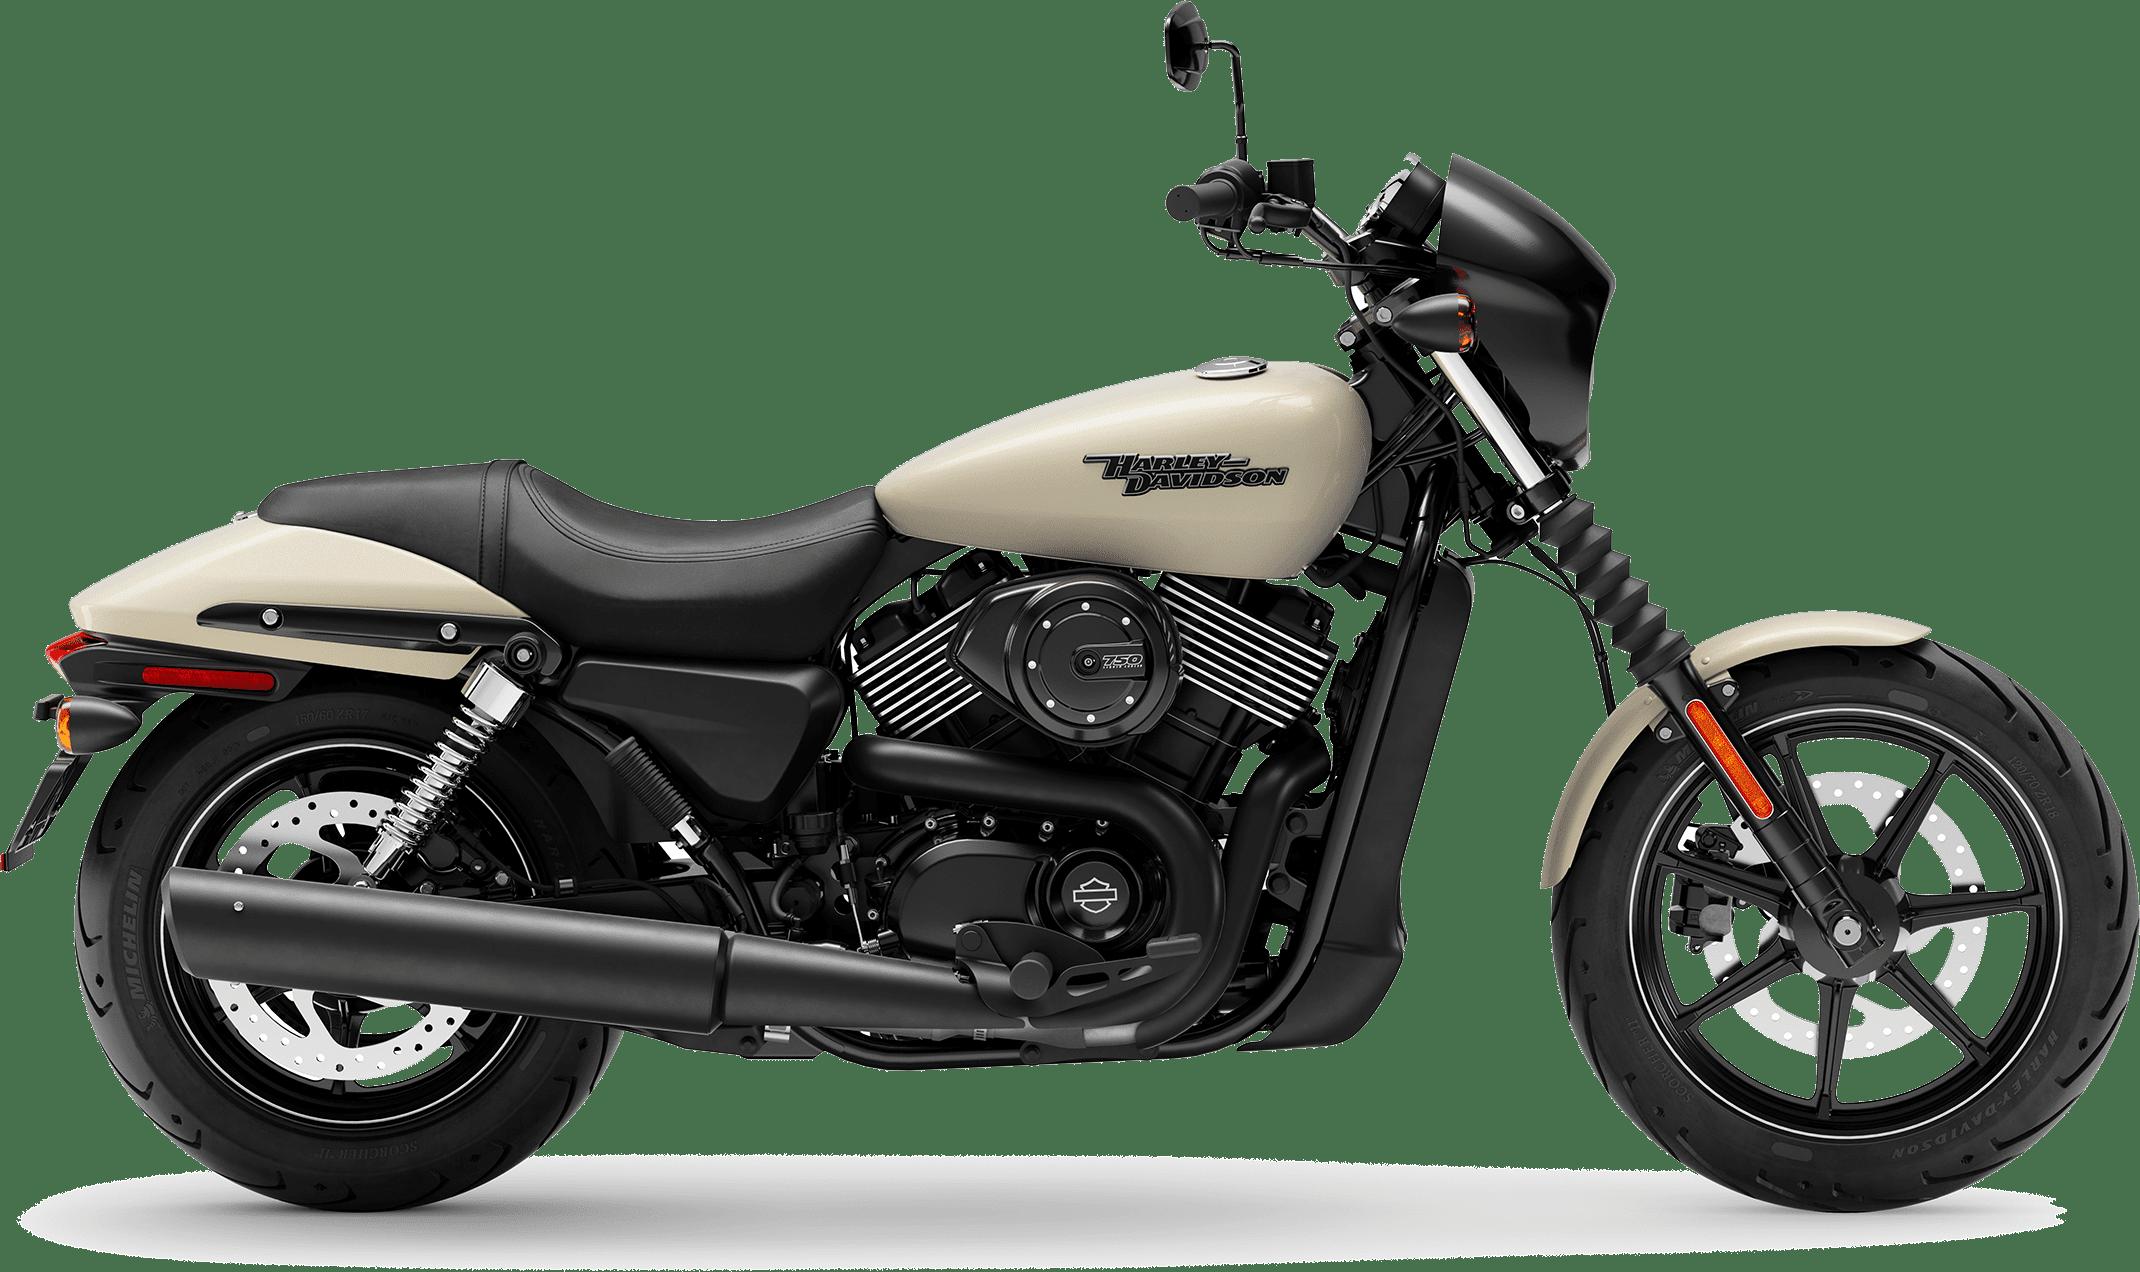 2019 Harley-Davidson H-D Street 750 Bonneville Salt Pearl